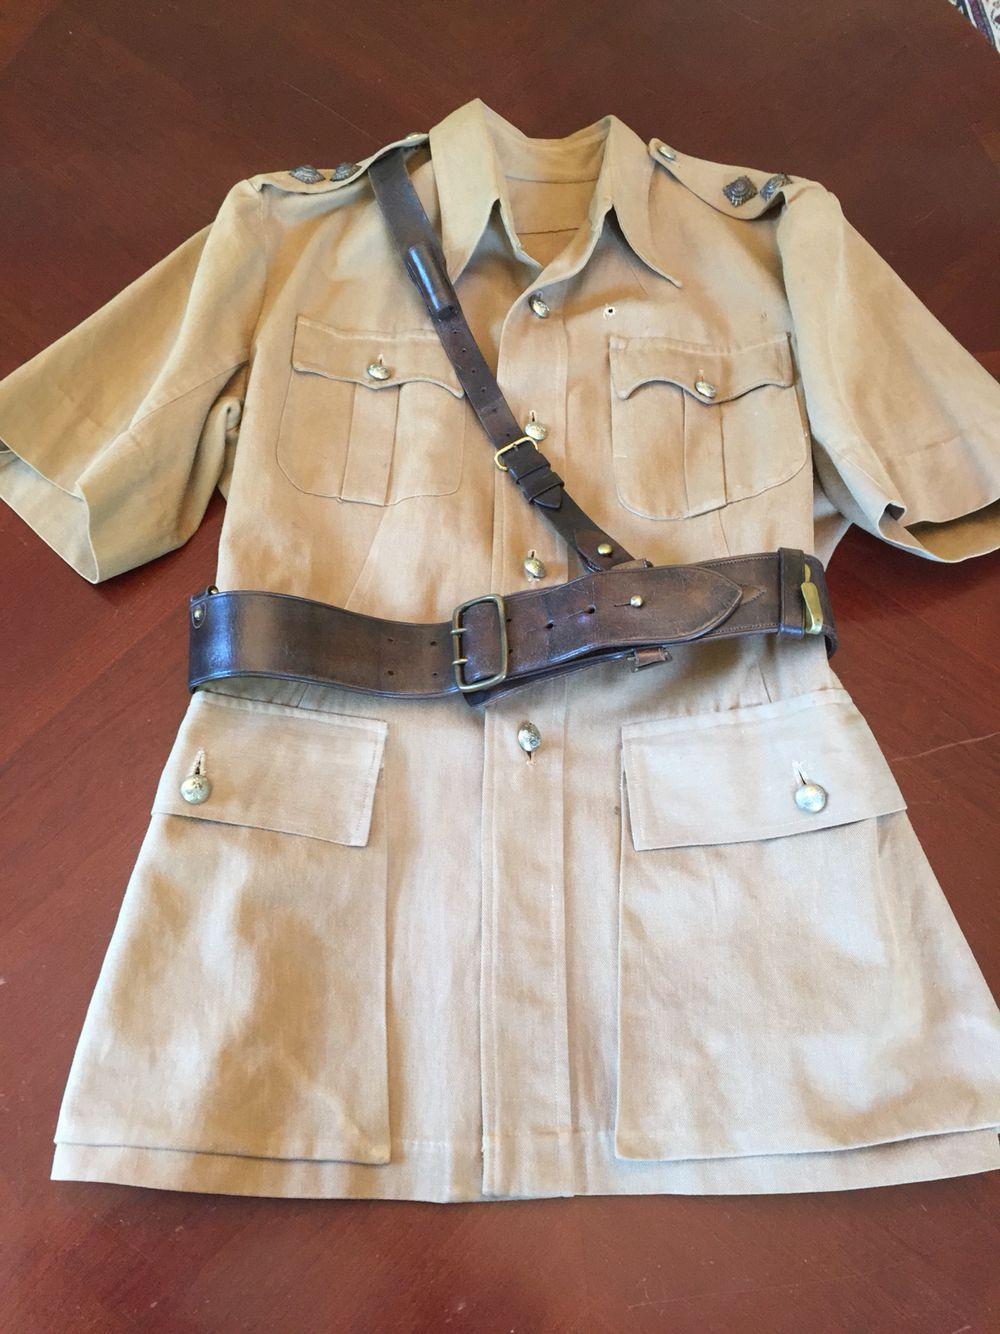 1839 - Birmingham Police Uniform, | Snell | Pinterest